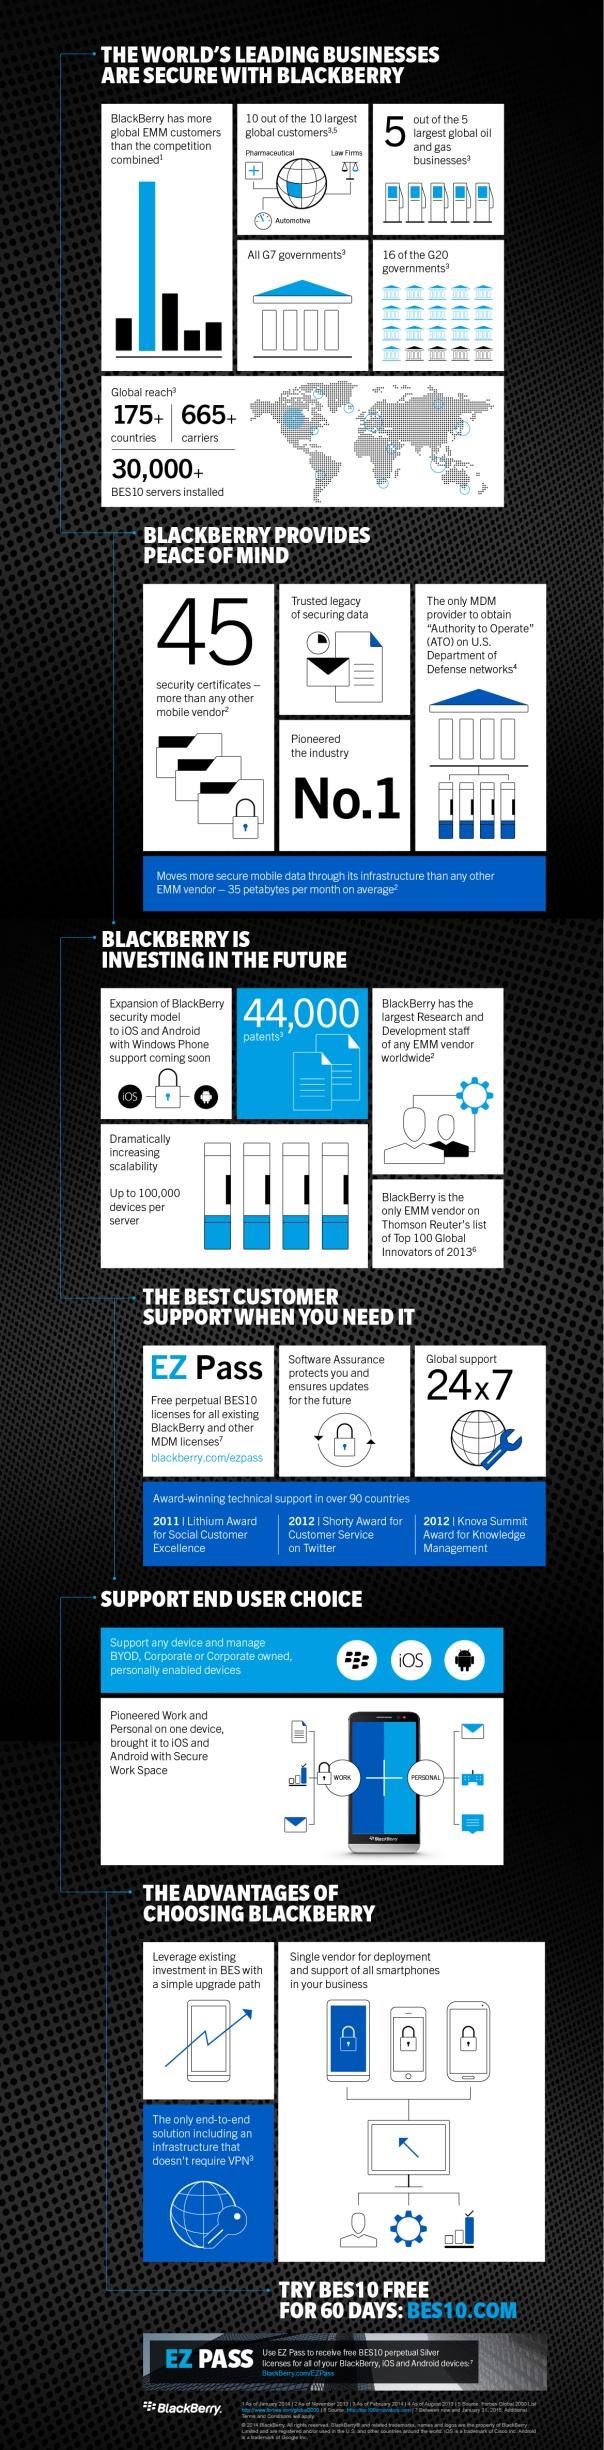 BBRY2454_EMM_Infographic